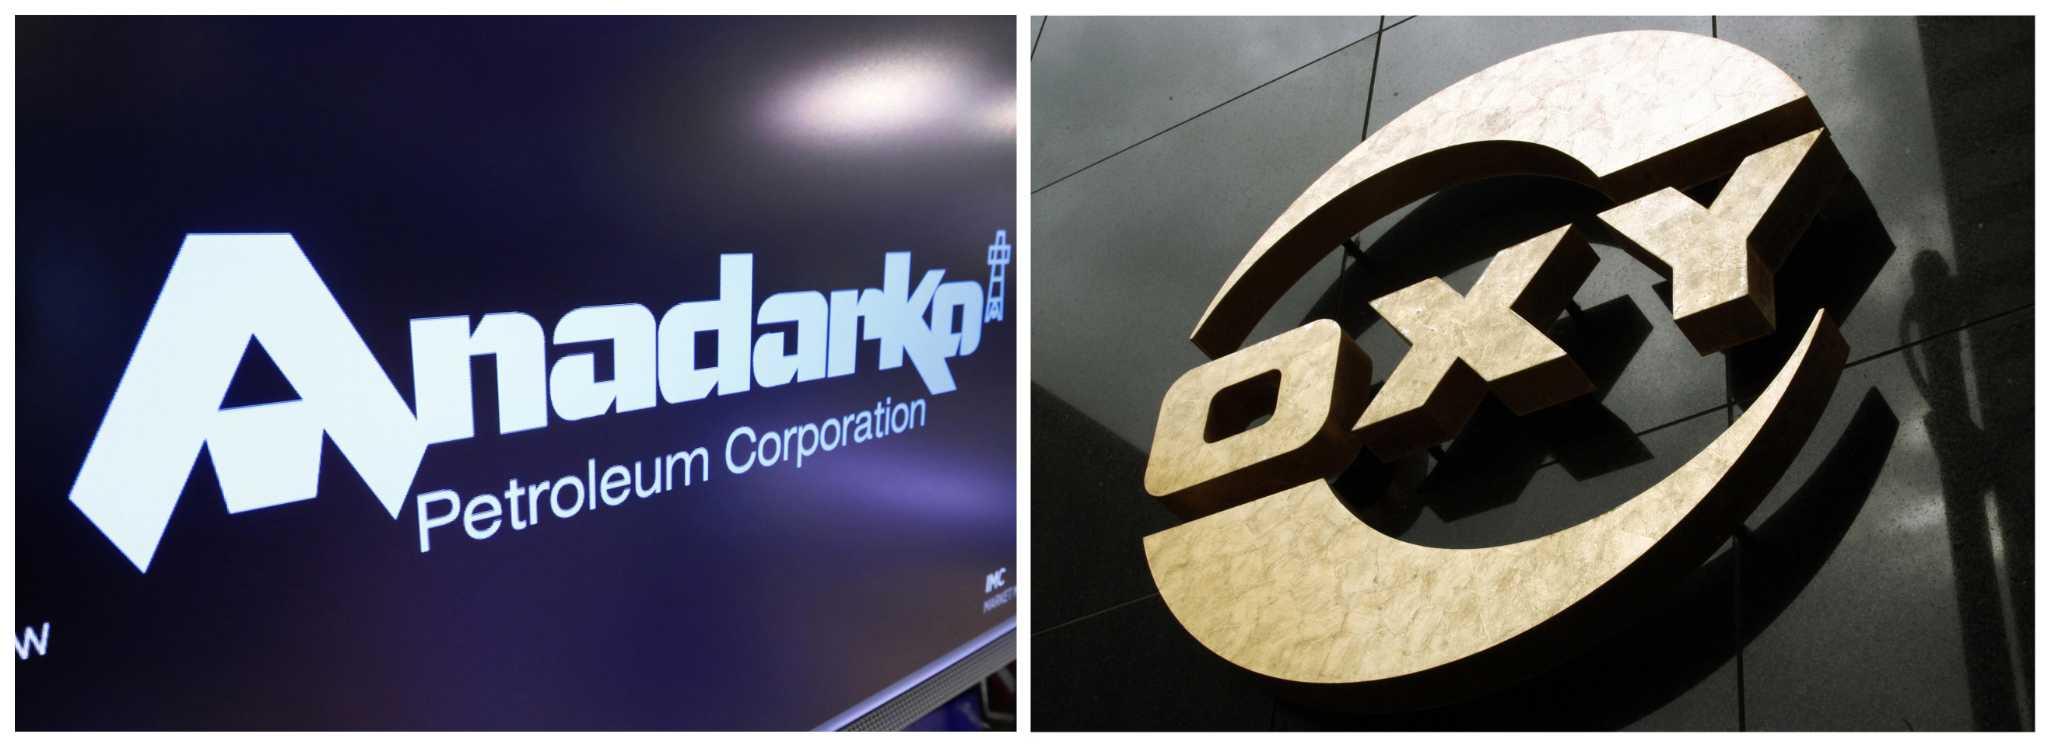 Anadarko sets August shareholder vote on Oxy takeover